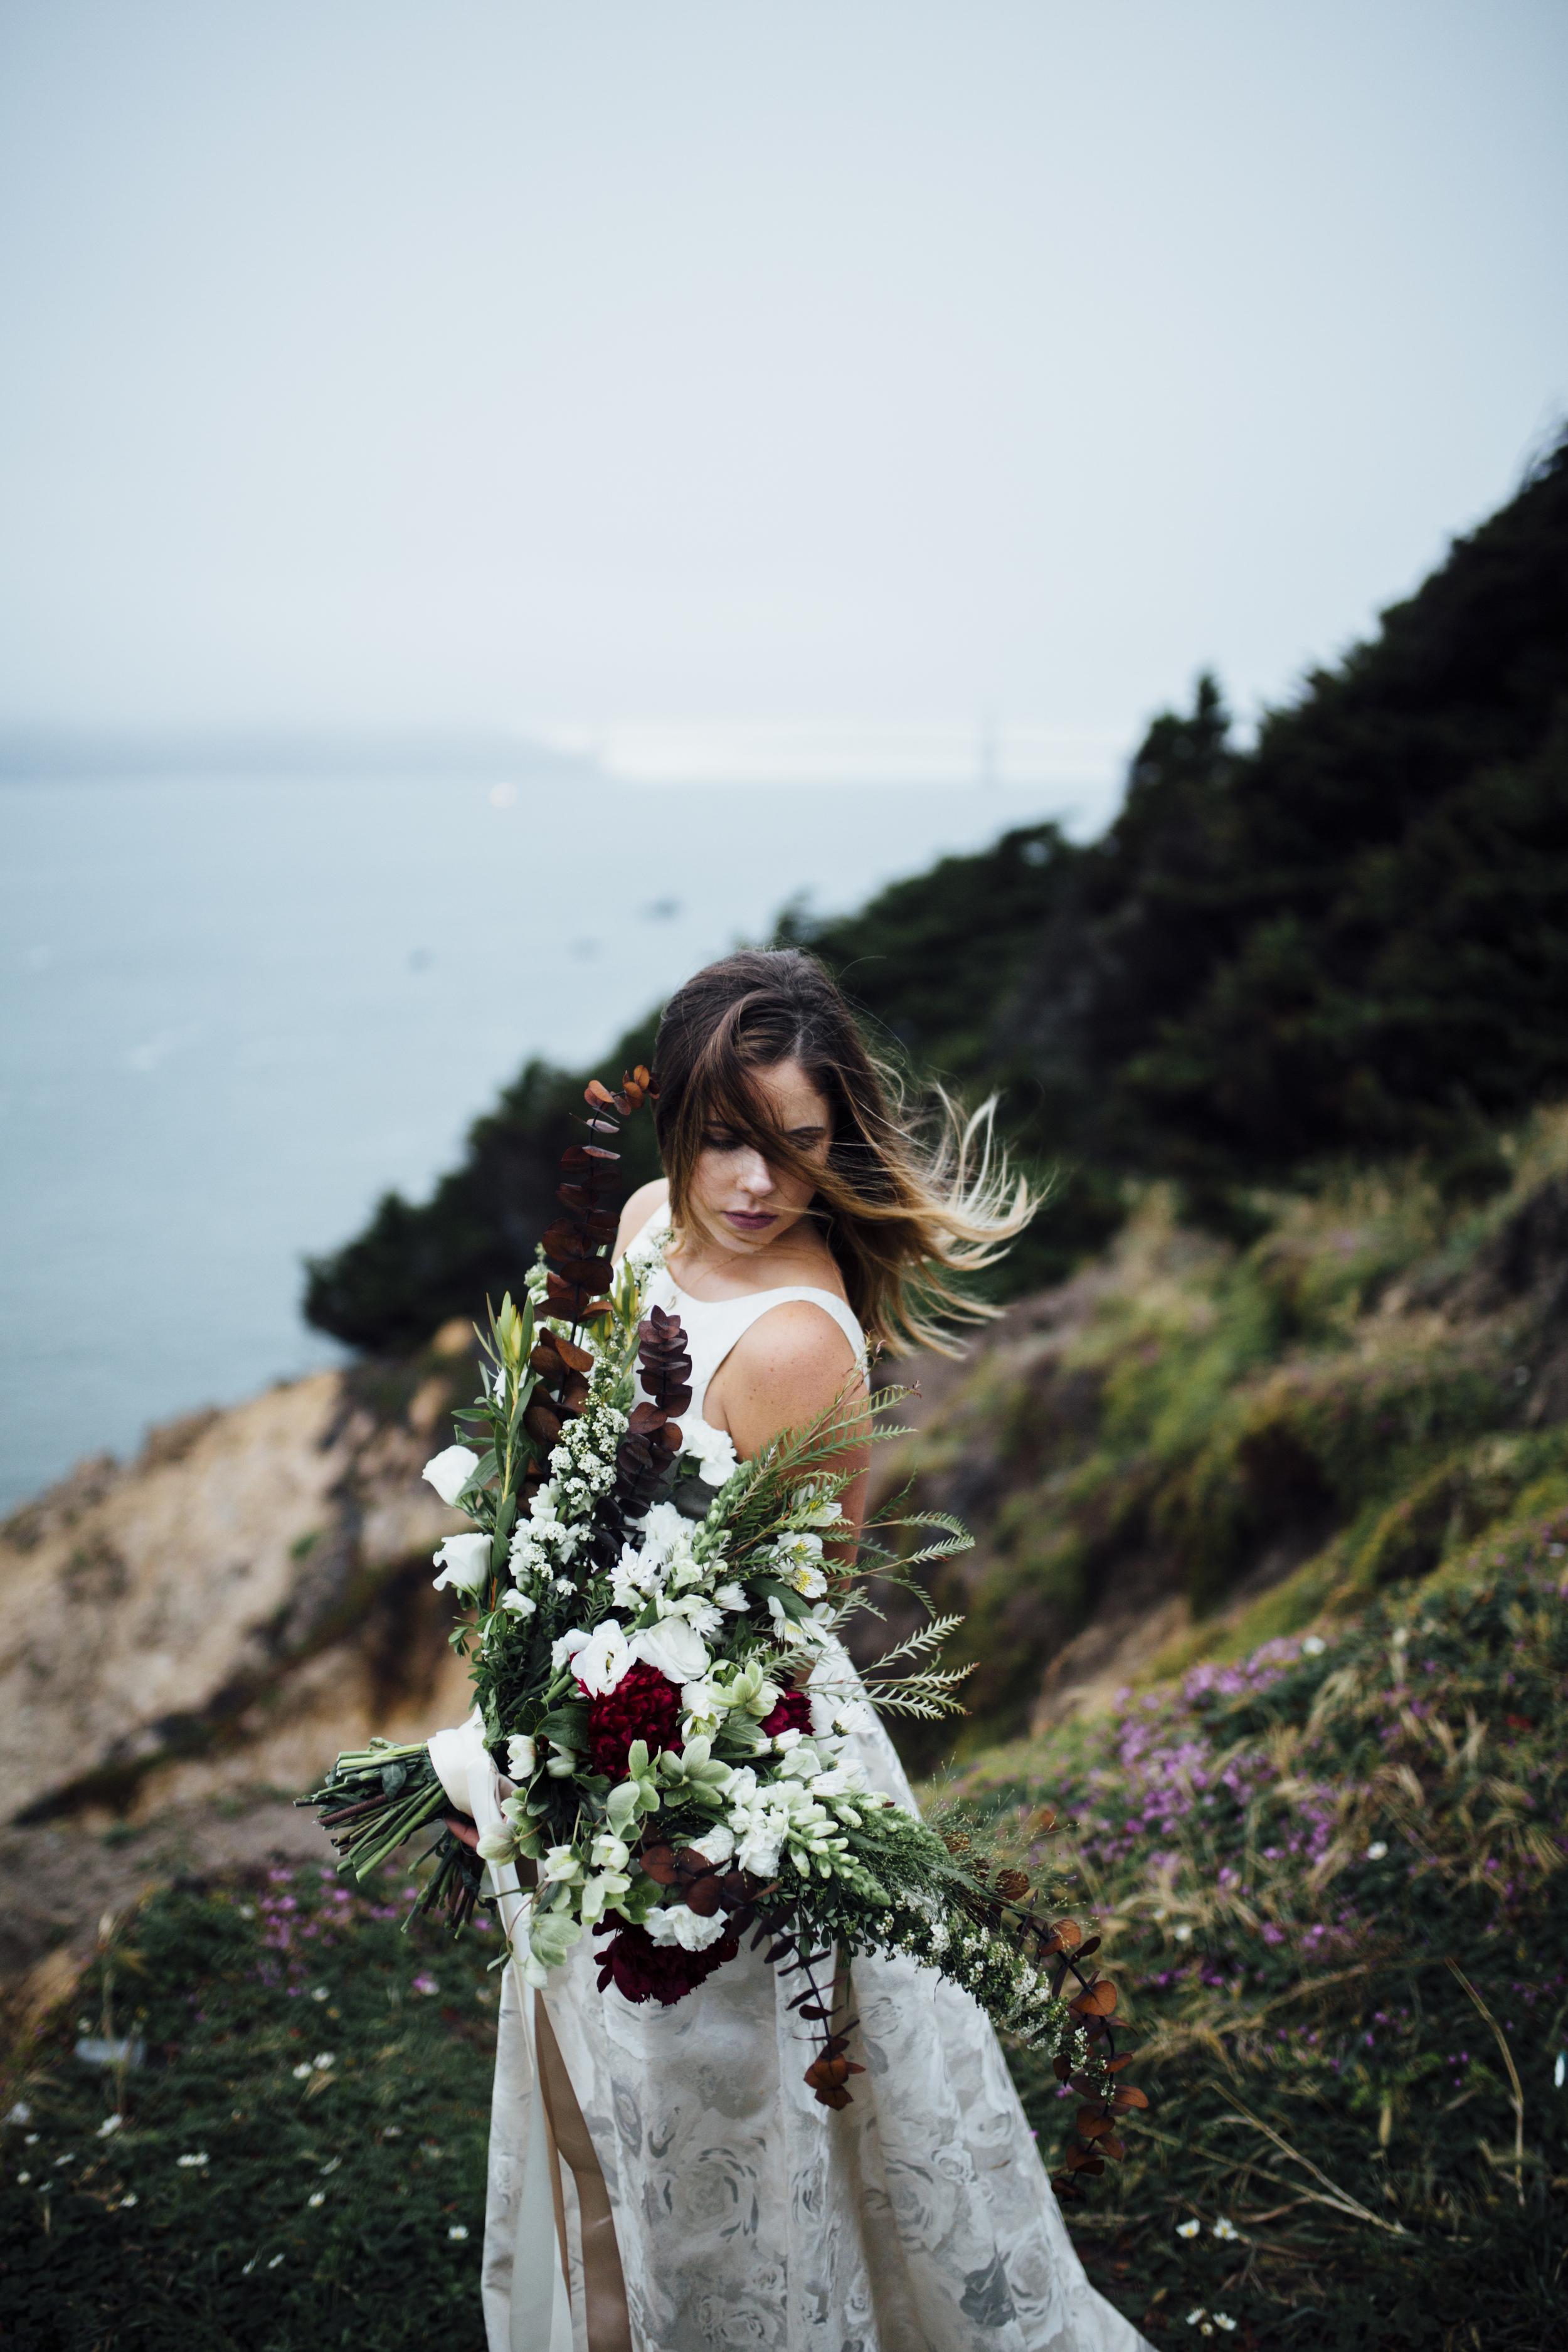 Nataly Zigdon Photography | San Francisco Bridal Shoot | Lands End | Roots Floral Design